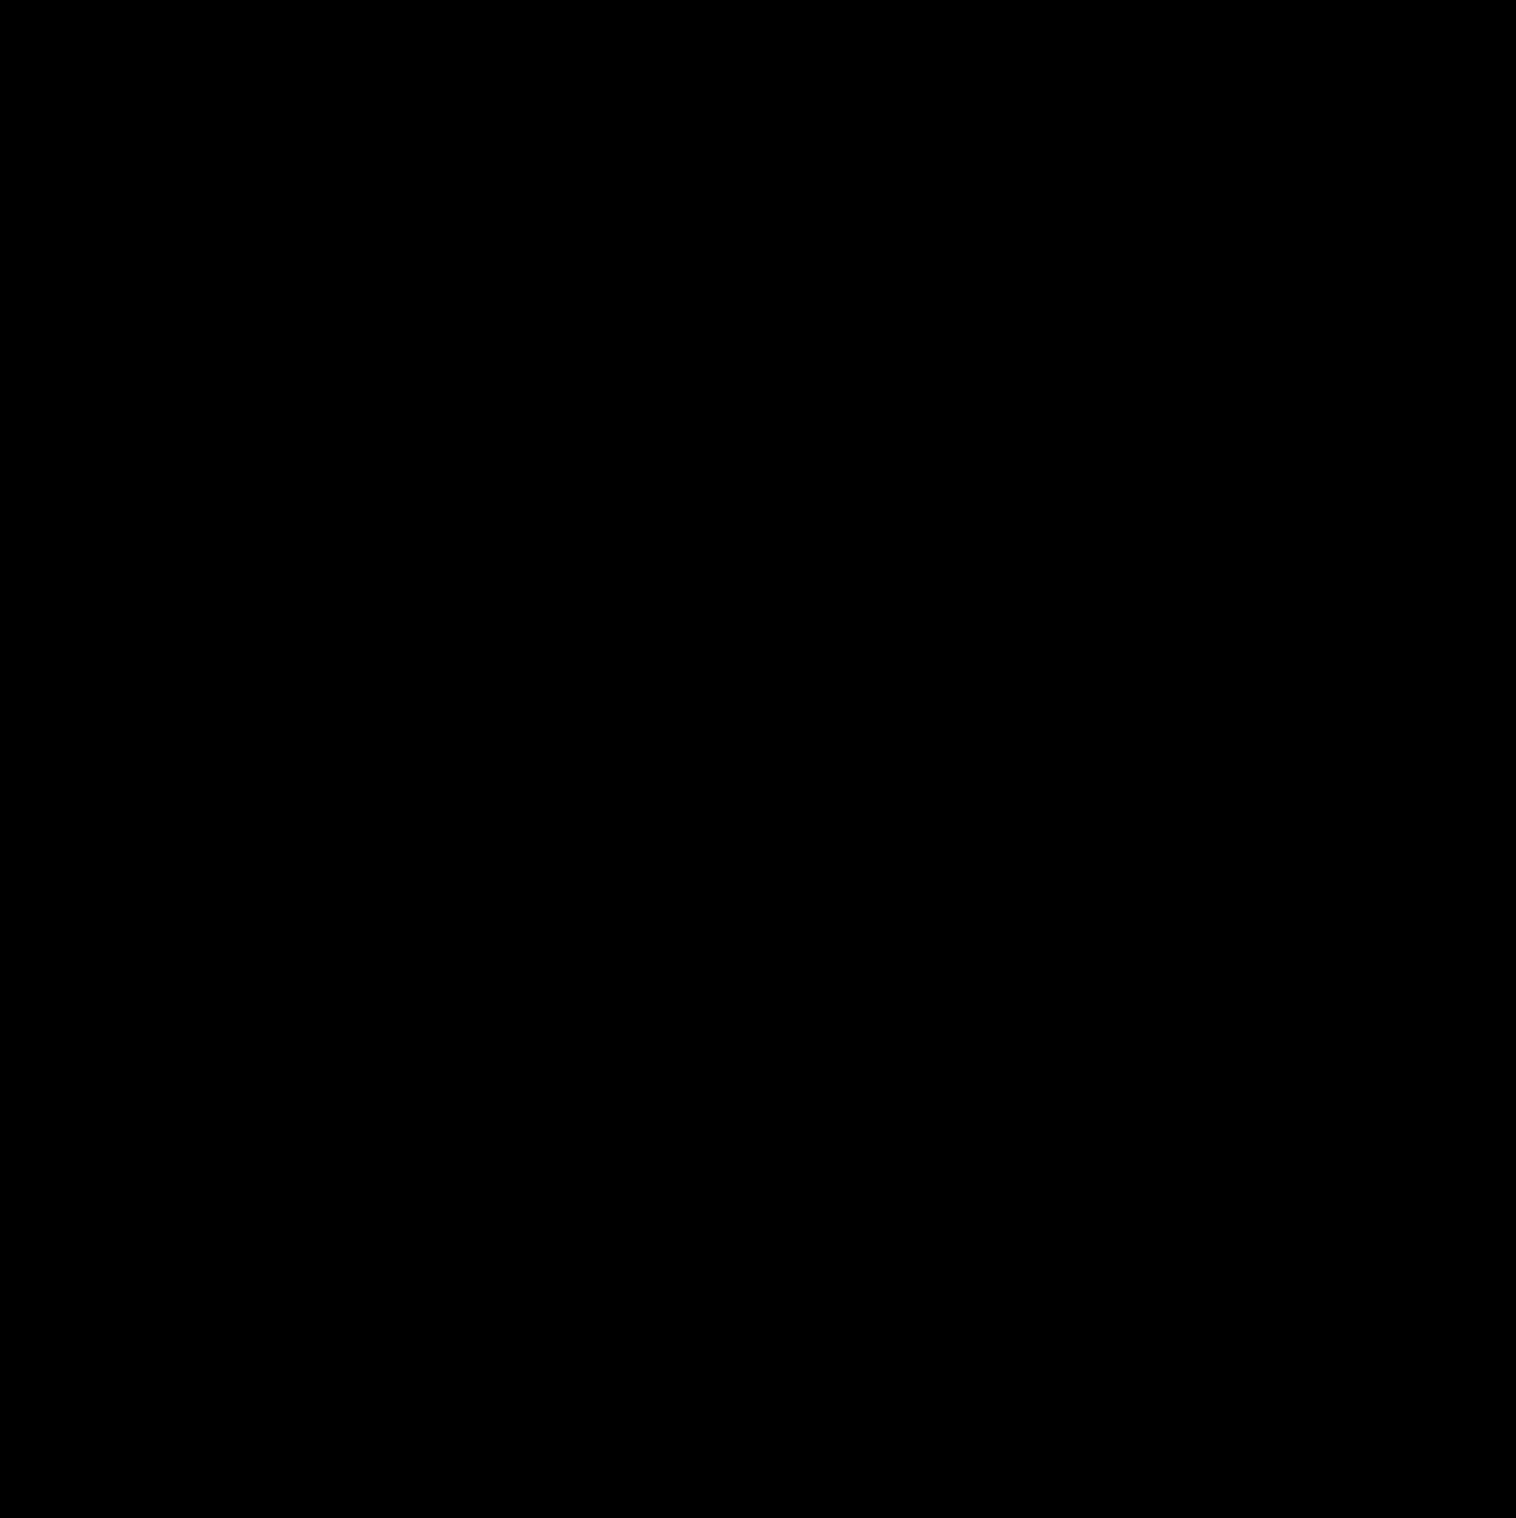 bvw-black-vert